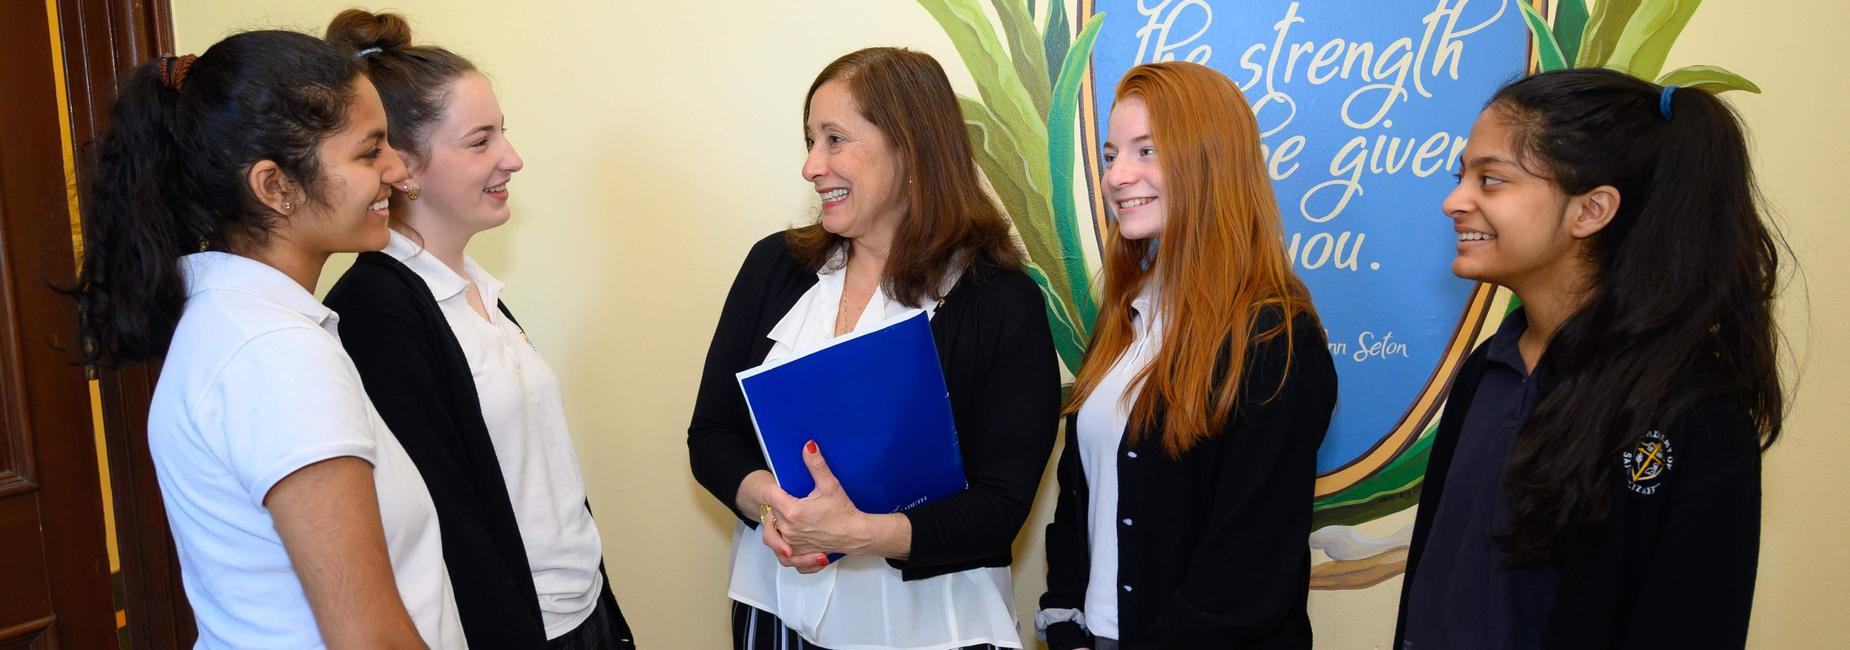 Catholic School - Morristown, Nj - Academy Of St. Elizabeth With Course Catalog University Of Rhode Island